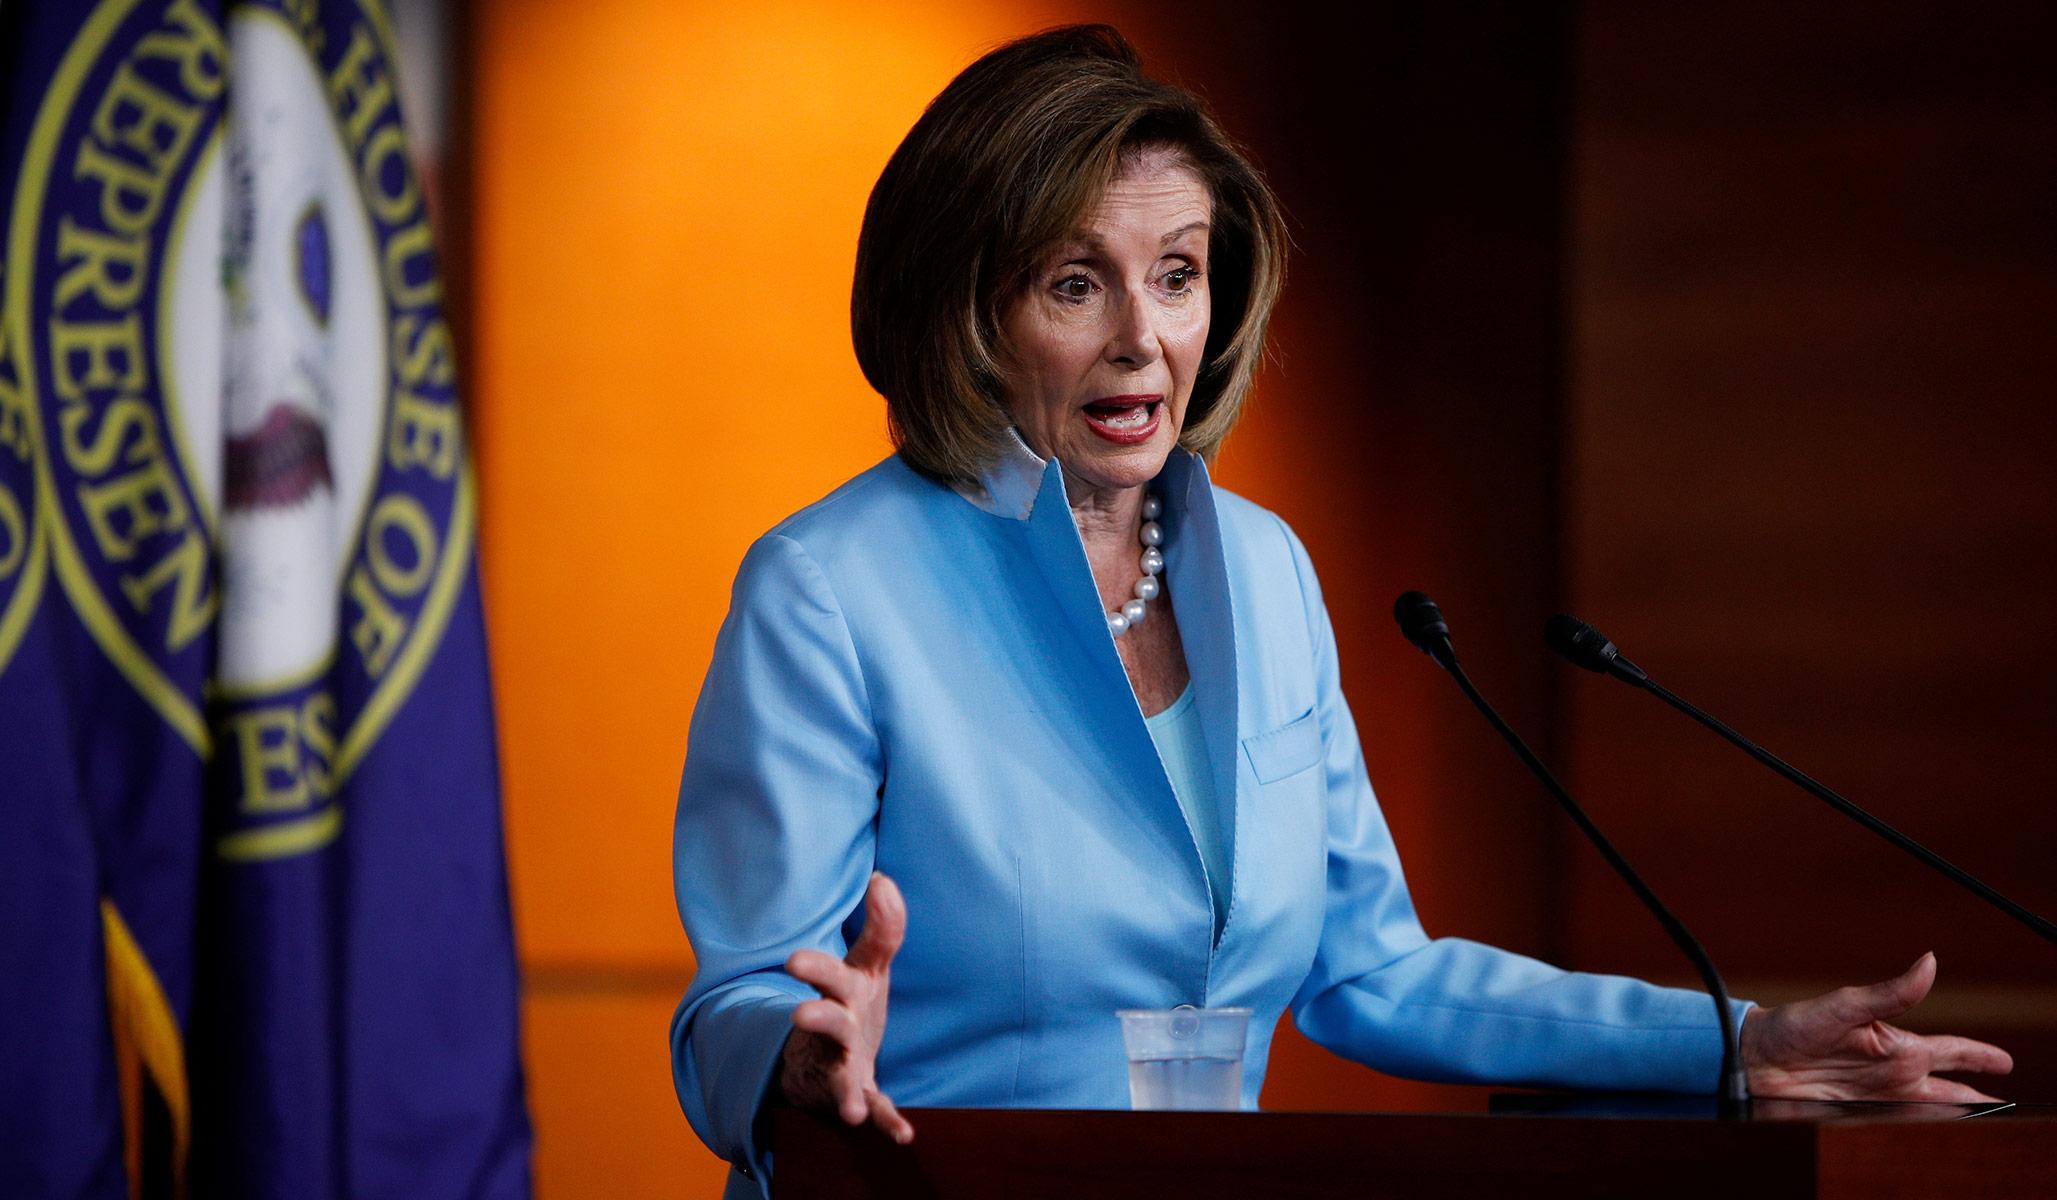 Pelosi: 'Seems Self-Evident' Reconciliation Bill Will Be Less Than $3.5 Trillion thumbnail